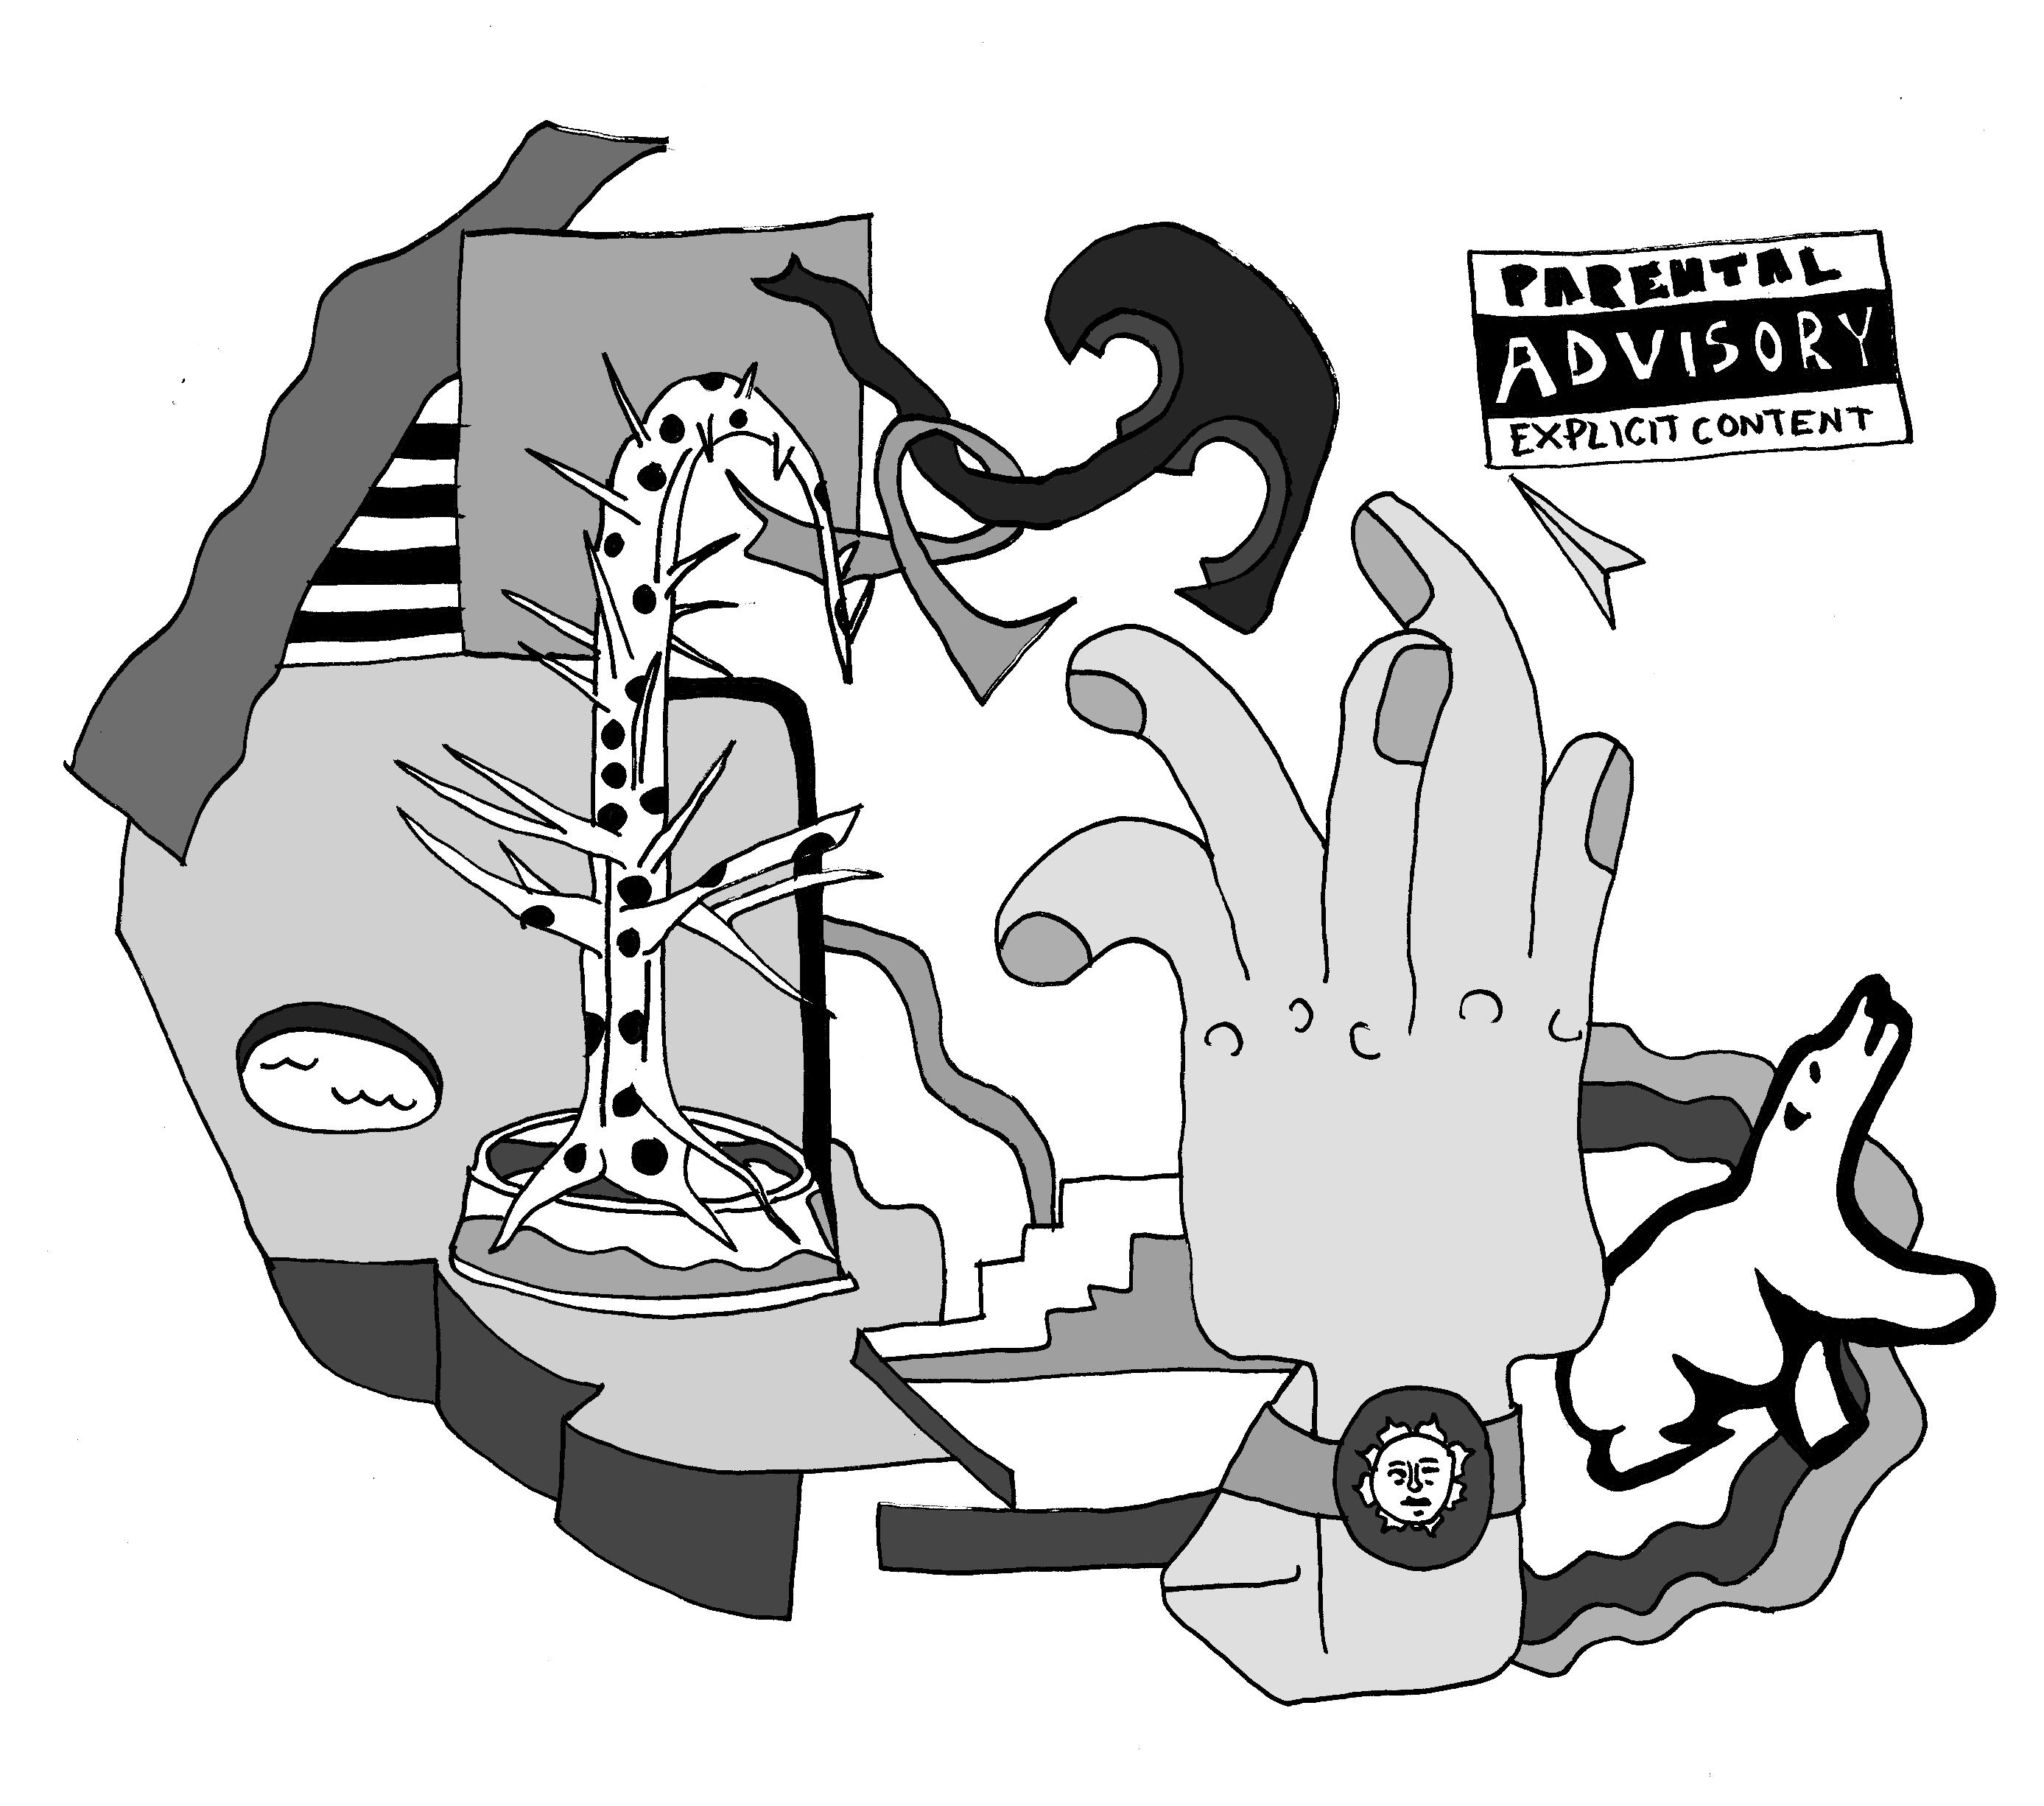 Parental advisory album cover clipart jpg transparent stock Four songs to celebrate the lasting legacy of Mac Miller ... jpg transparent stock